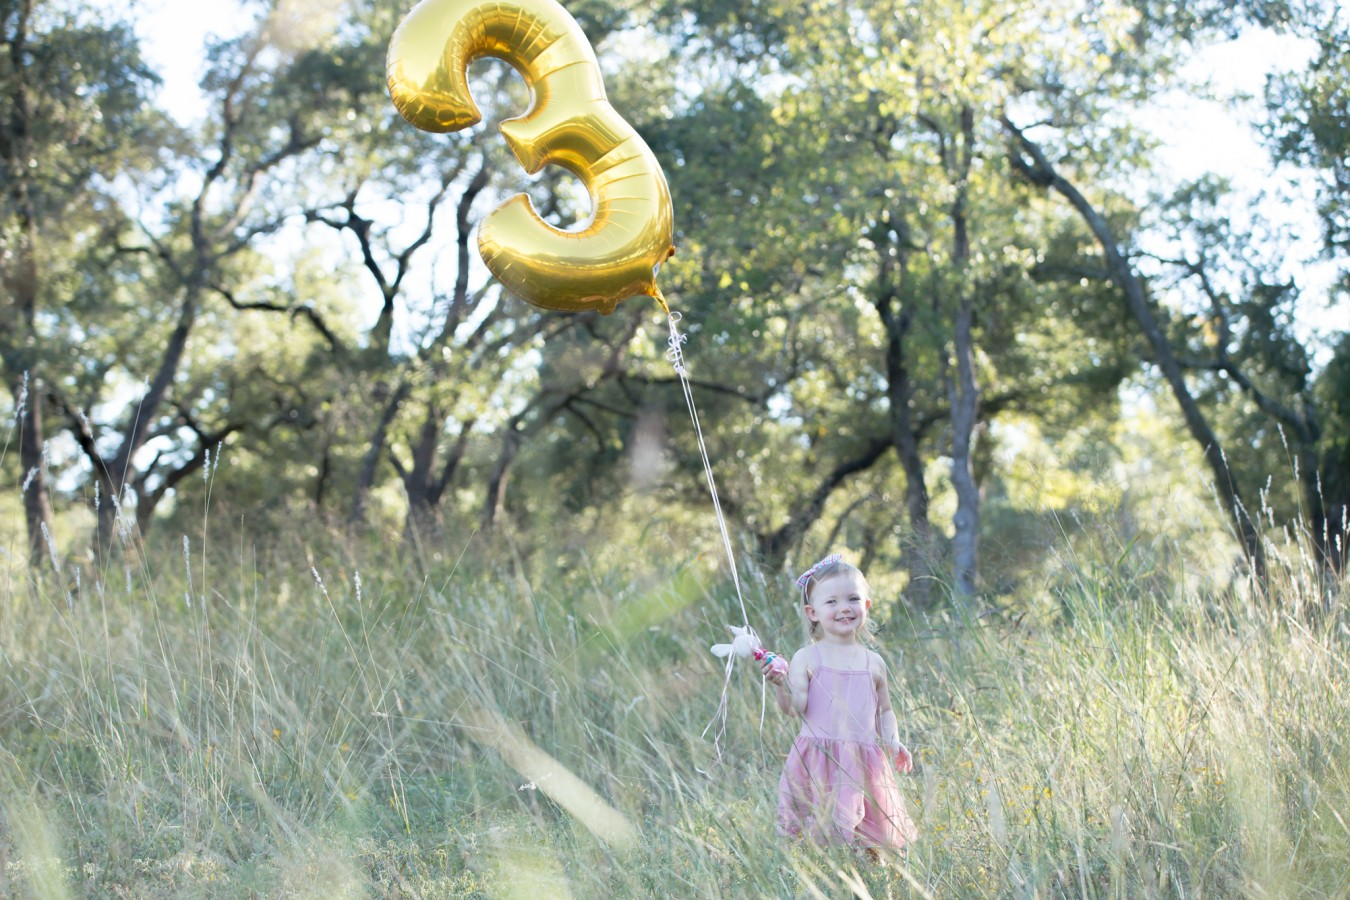 HighDotStudios - Birthdays and Milestones (6)